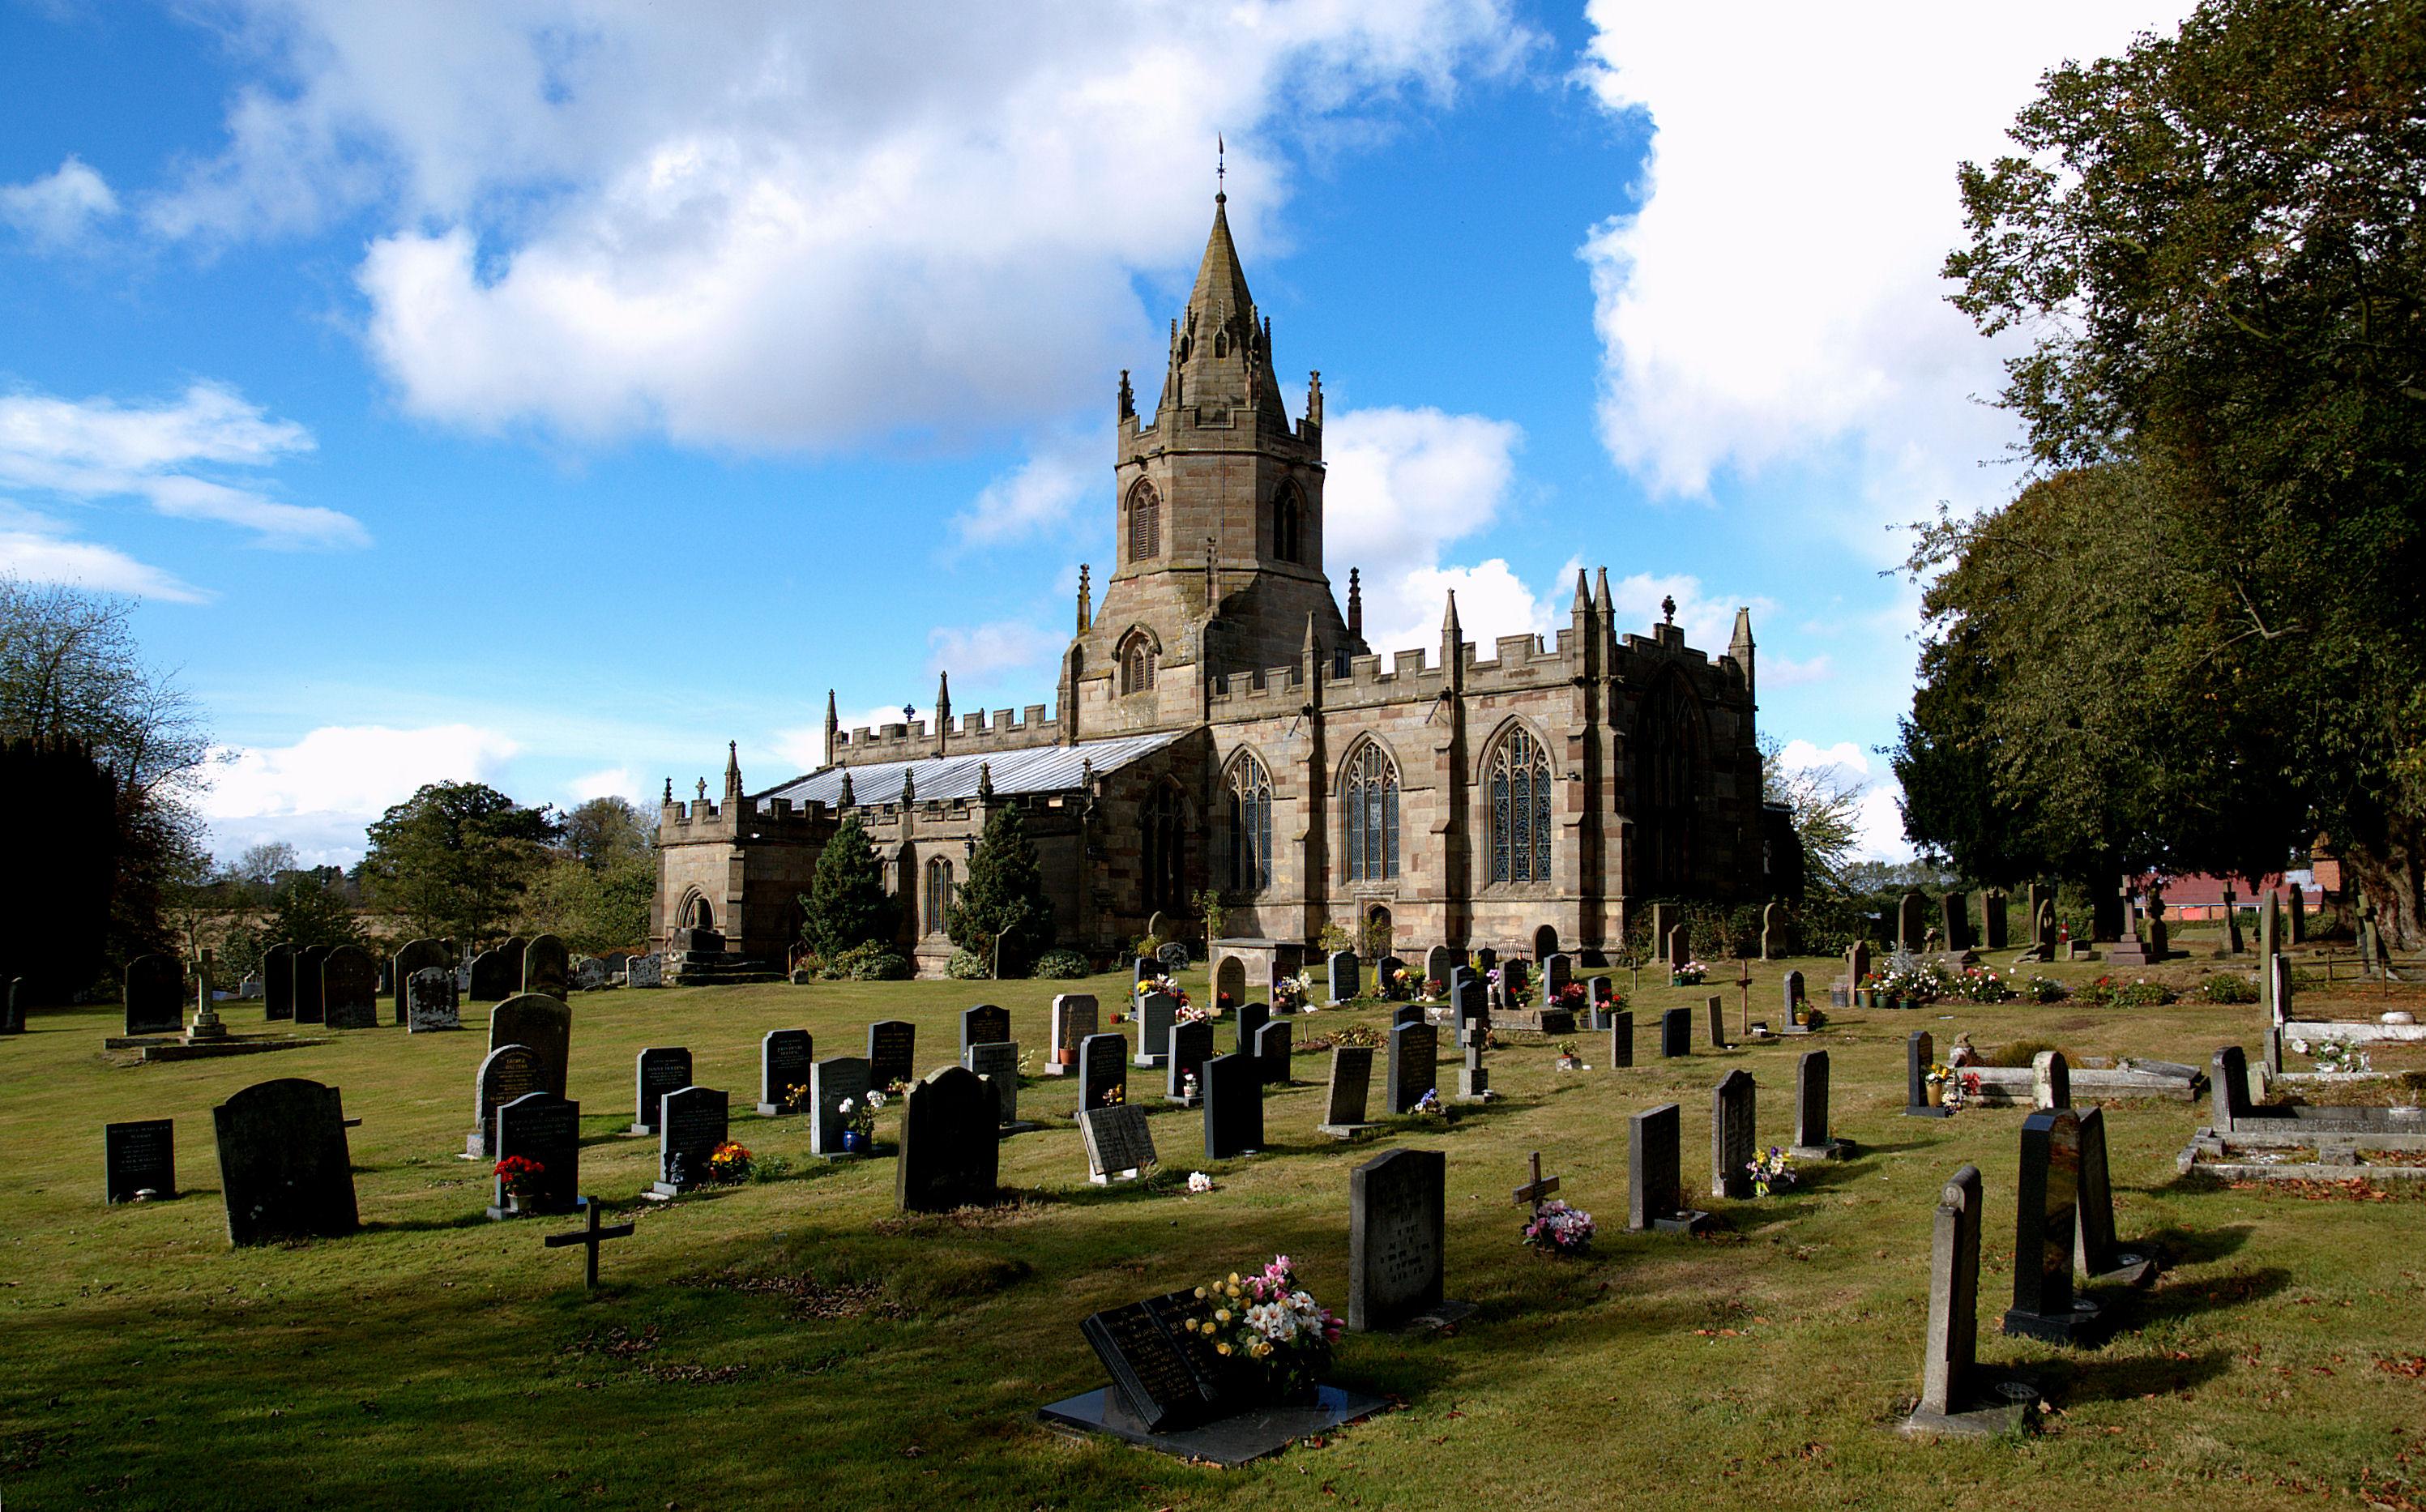 File:Tong, Shropshire, St. Bartholomew's church.jpg - Wikimedia